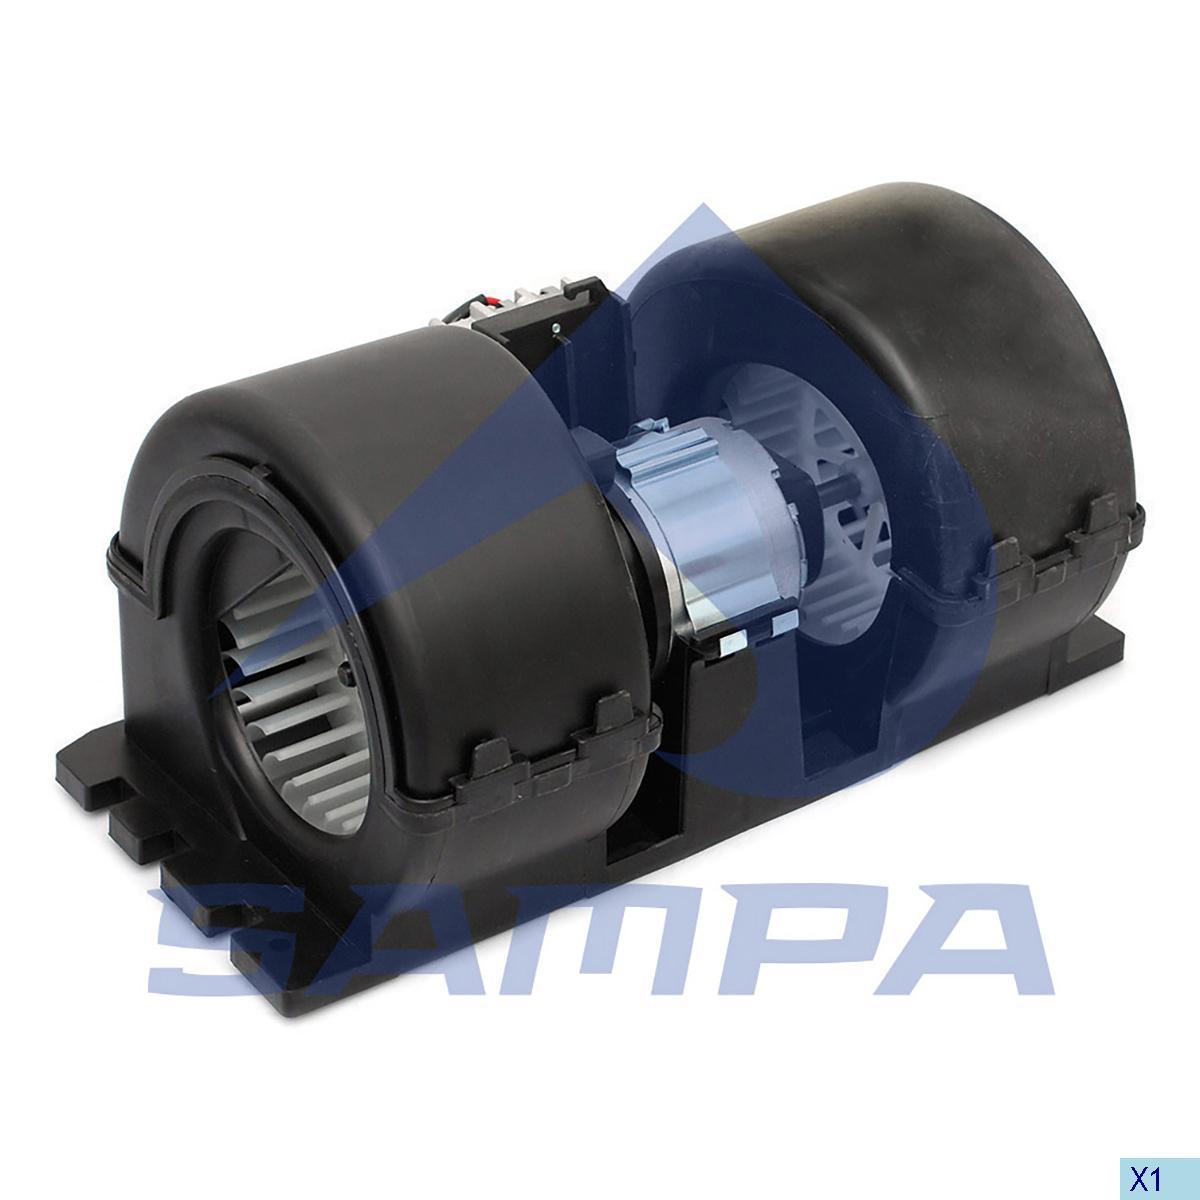 Fan Motor, Cab Heating & Ventilation, Man, Cab